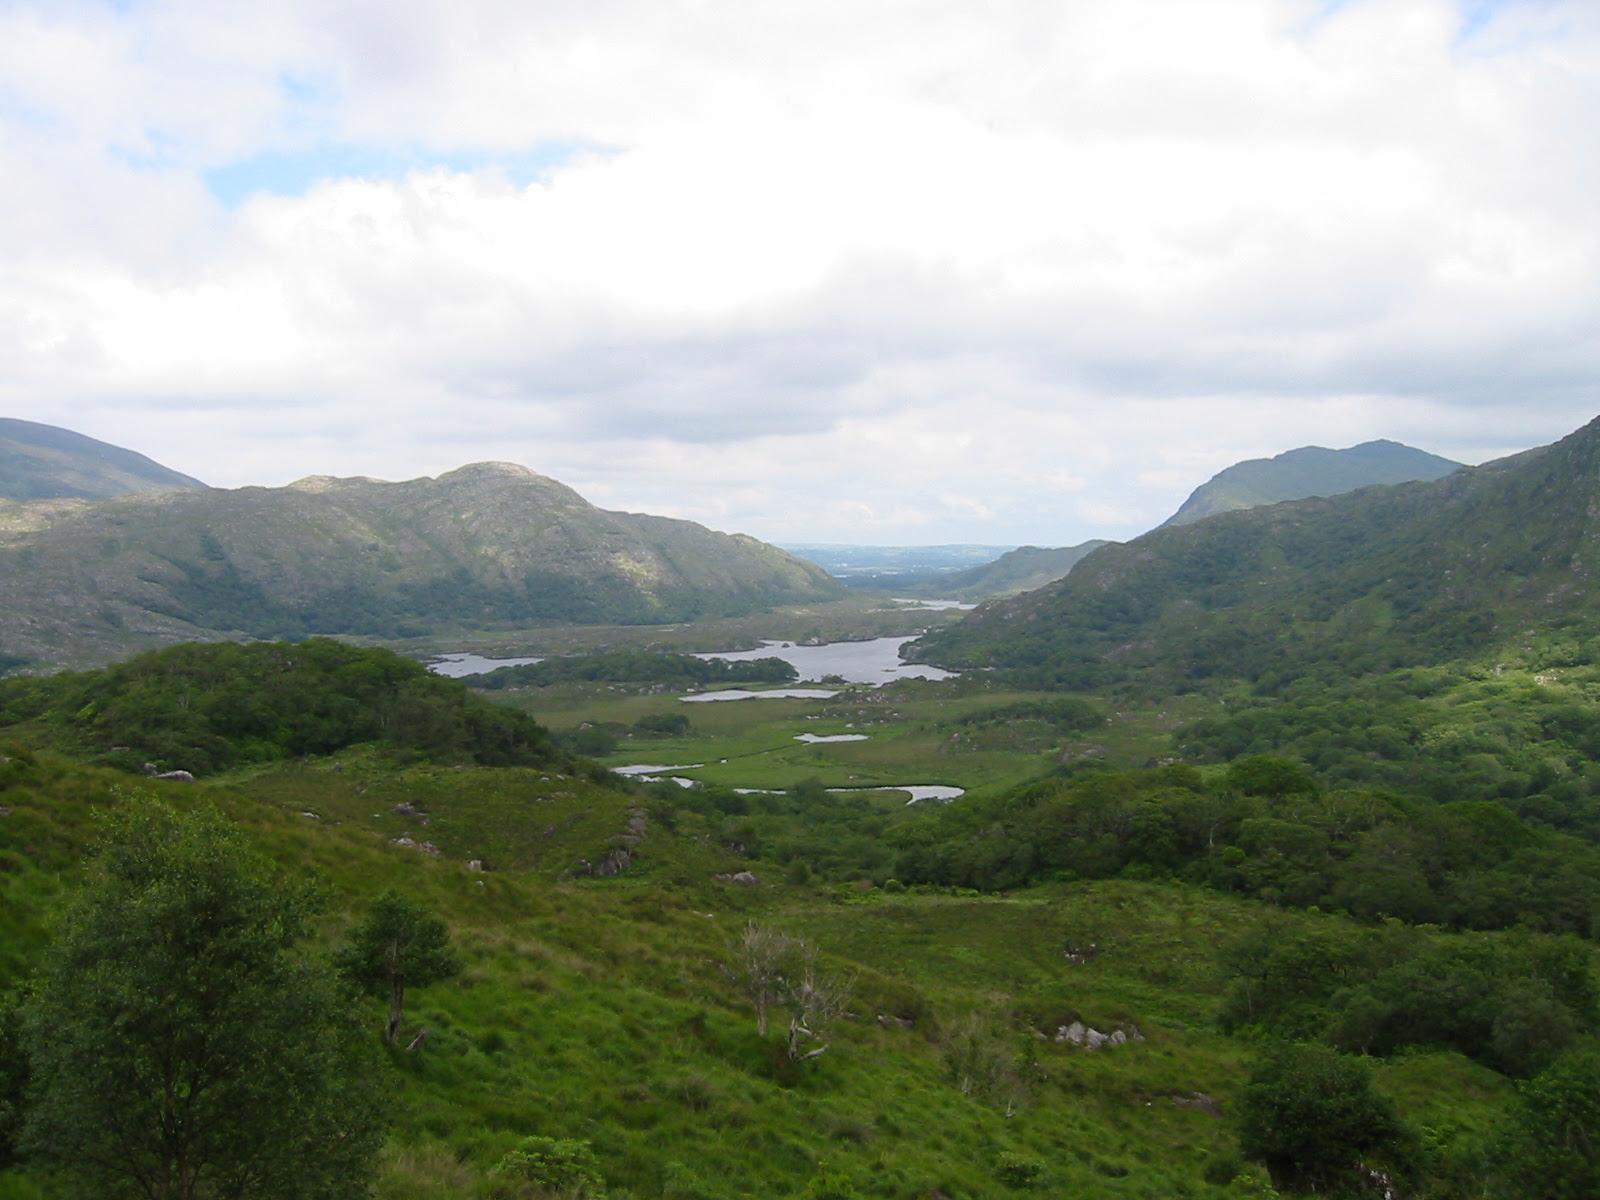 http://upload.wikimedia.org/wikipedia/commons/9/9c/Lakes_of_Killarney.JPG